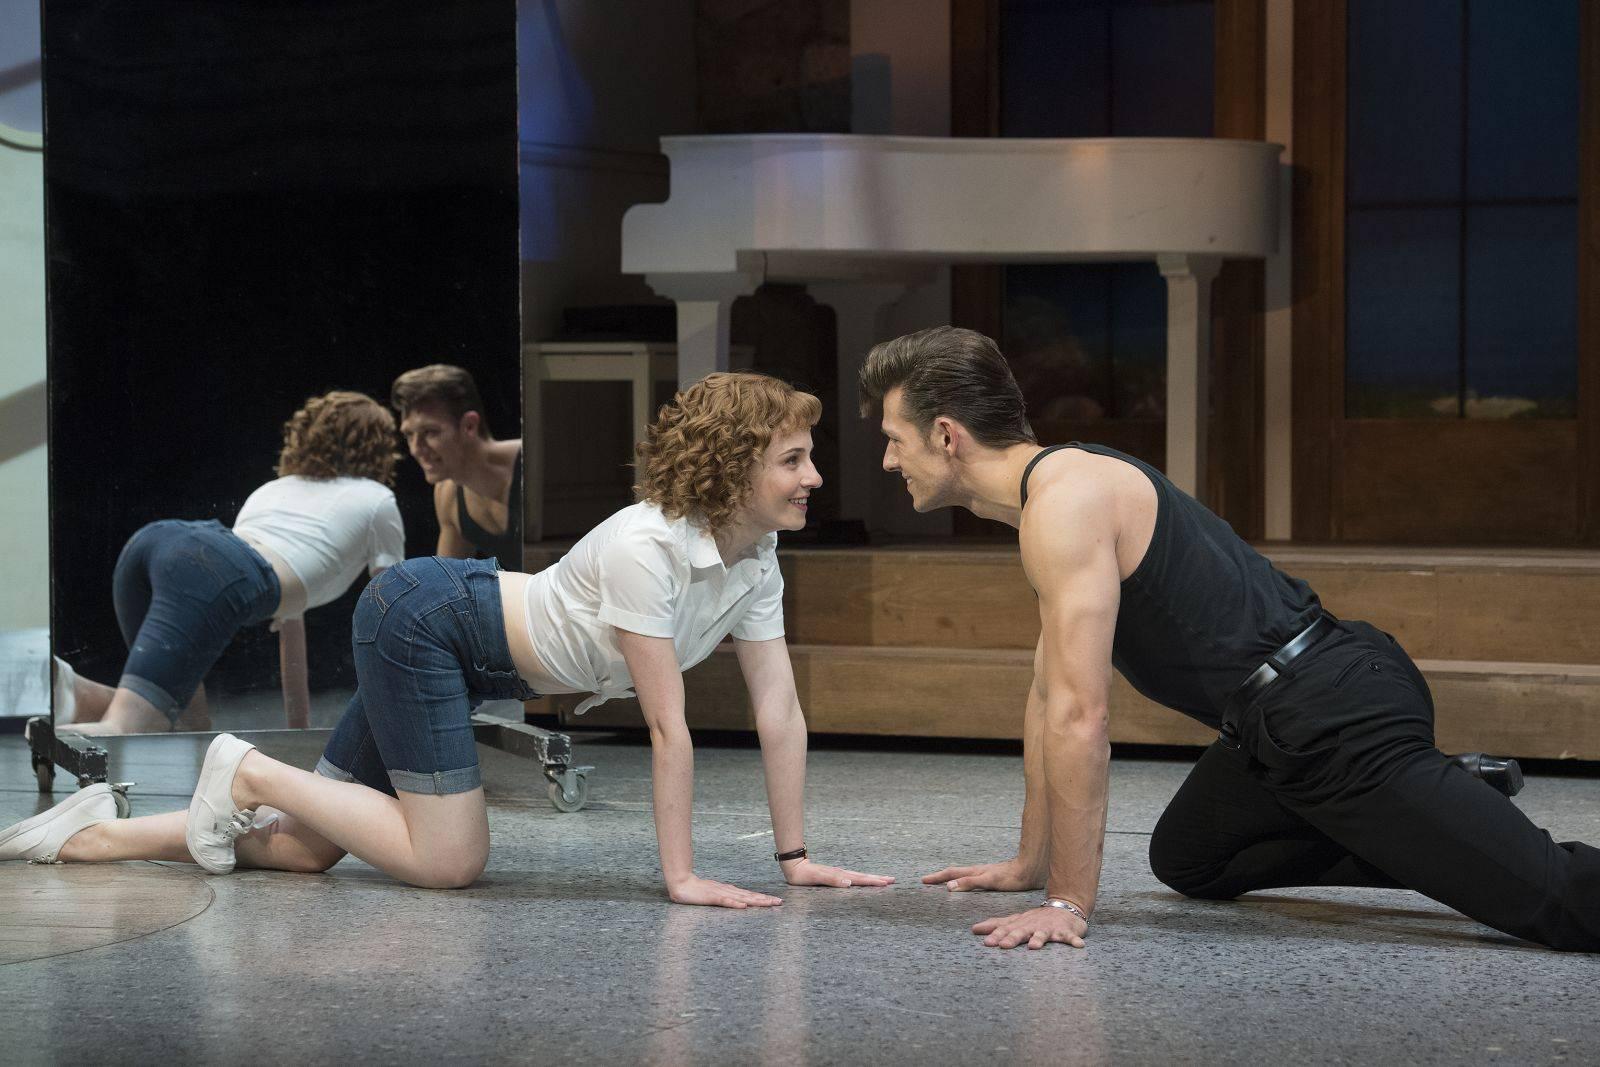 Obra de teatro Dirty Dancing. Fotografía de la web oficial de la obra.